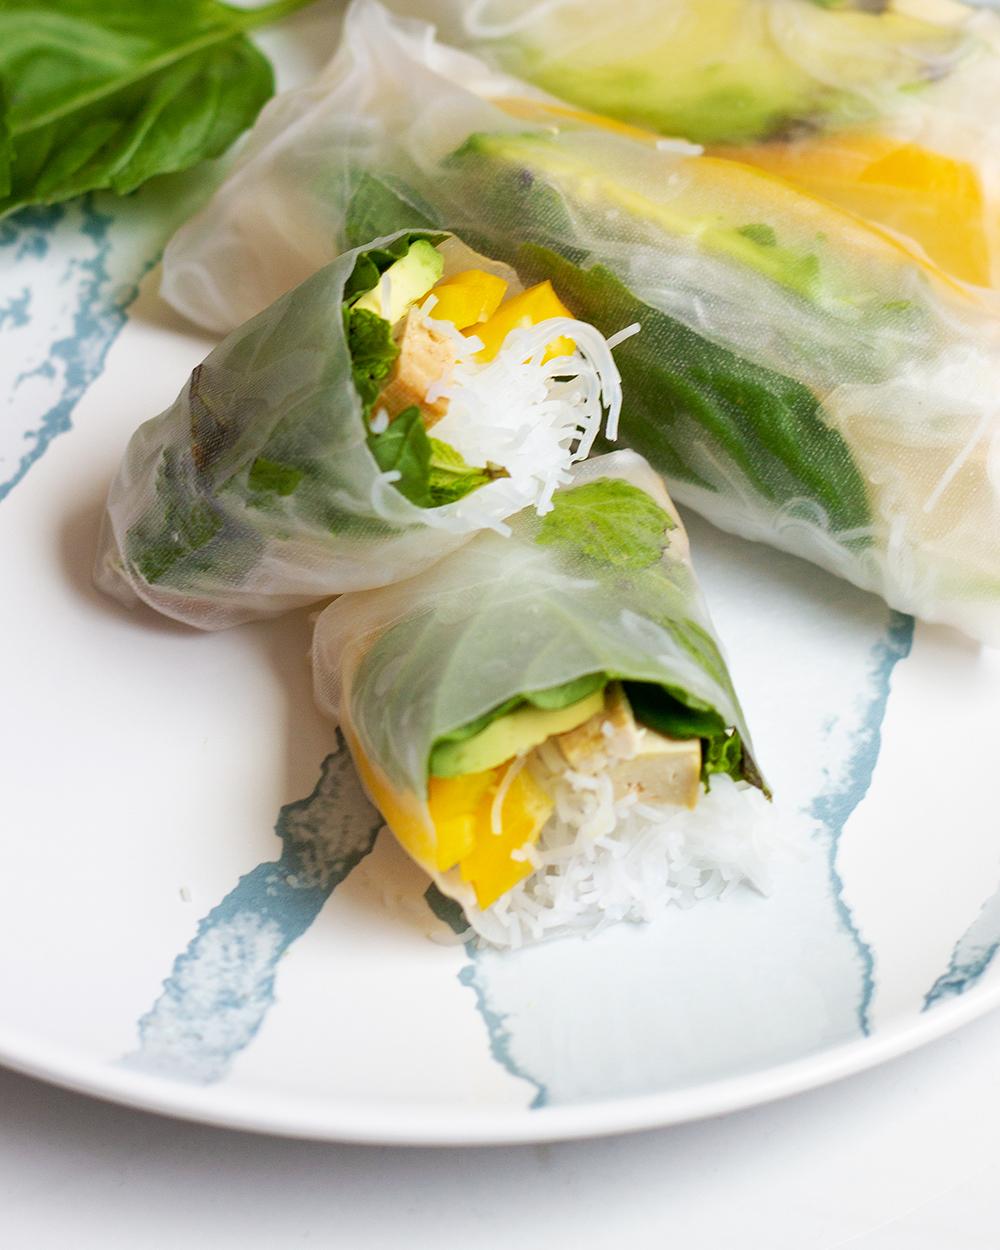 livvyland-blog-olivia-watson-austin-texas-lifestyle-blog-vegetarian-tofu-spring-rolls-peanut-sauce-elizabeth-street-cafe-recipe-2